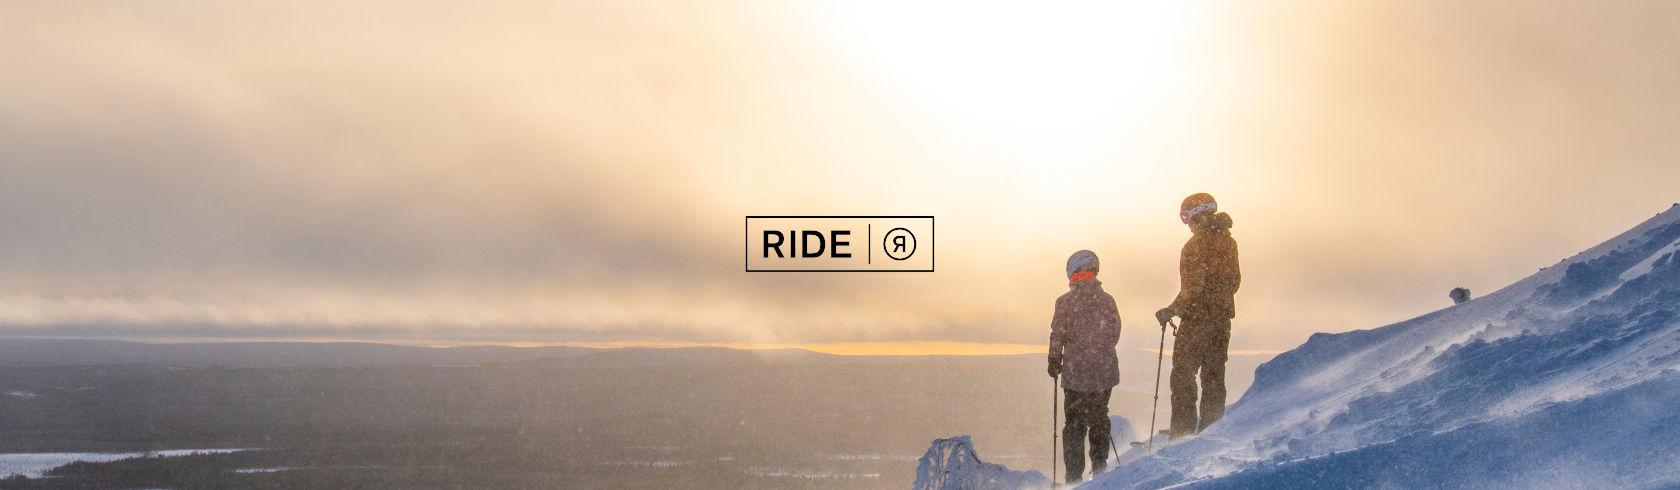 Ride Snowboards brand logo